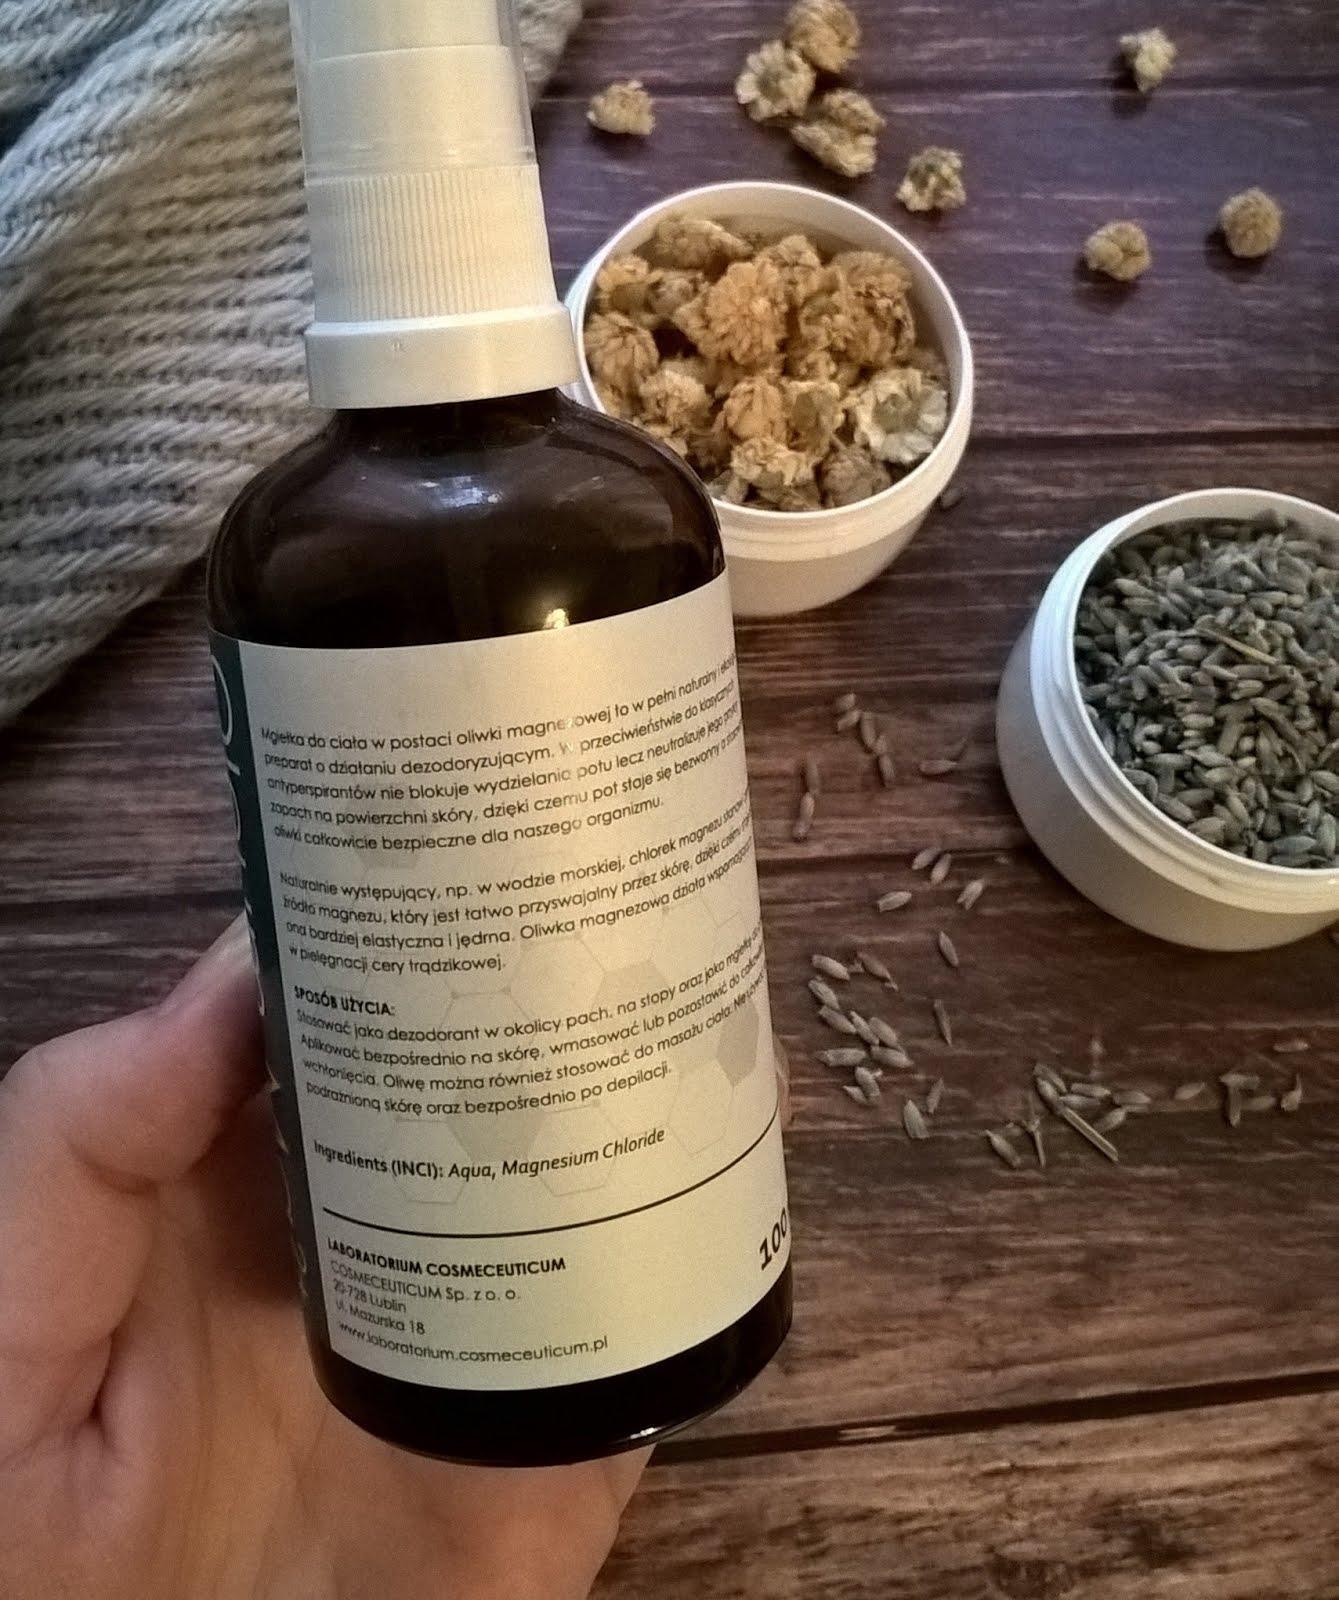 Laboratorium Cosmeceuticum, Oliwa Magnezowa 40% recenzja blog skład